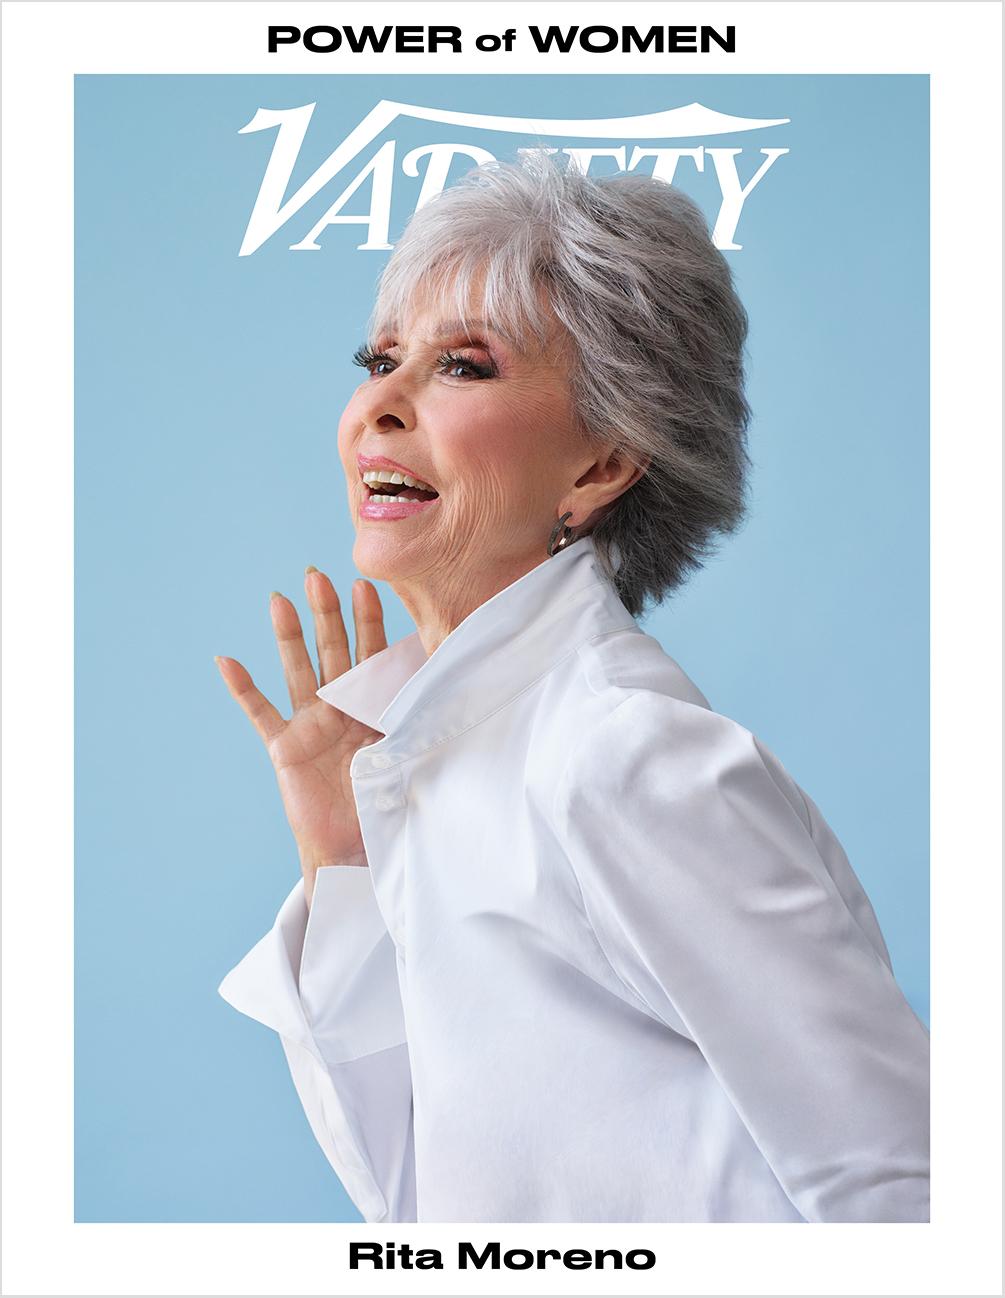 Rita Moreno Power of Women Variety